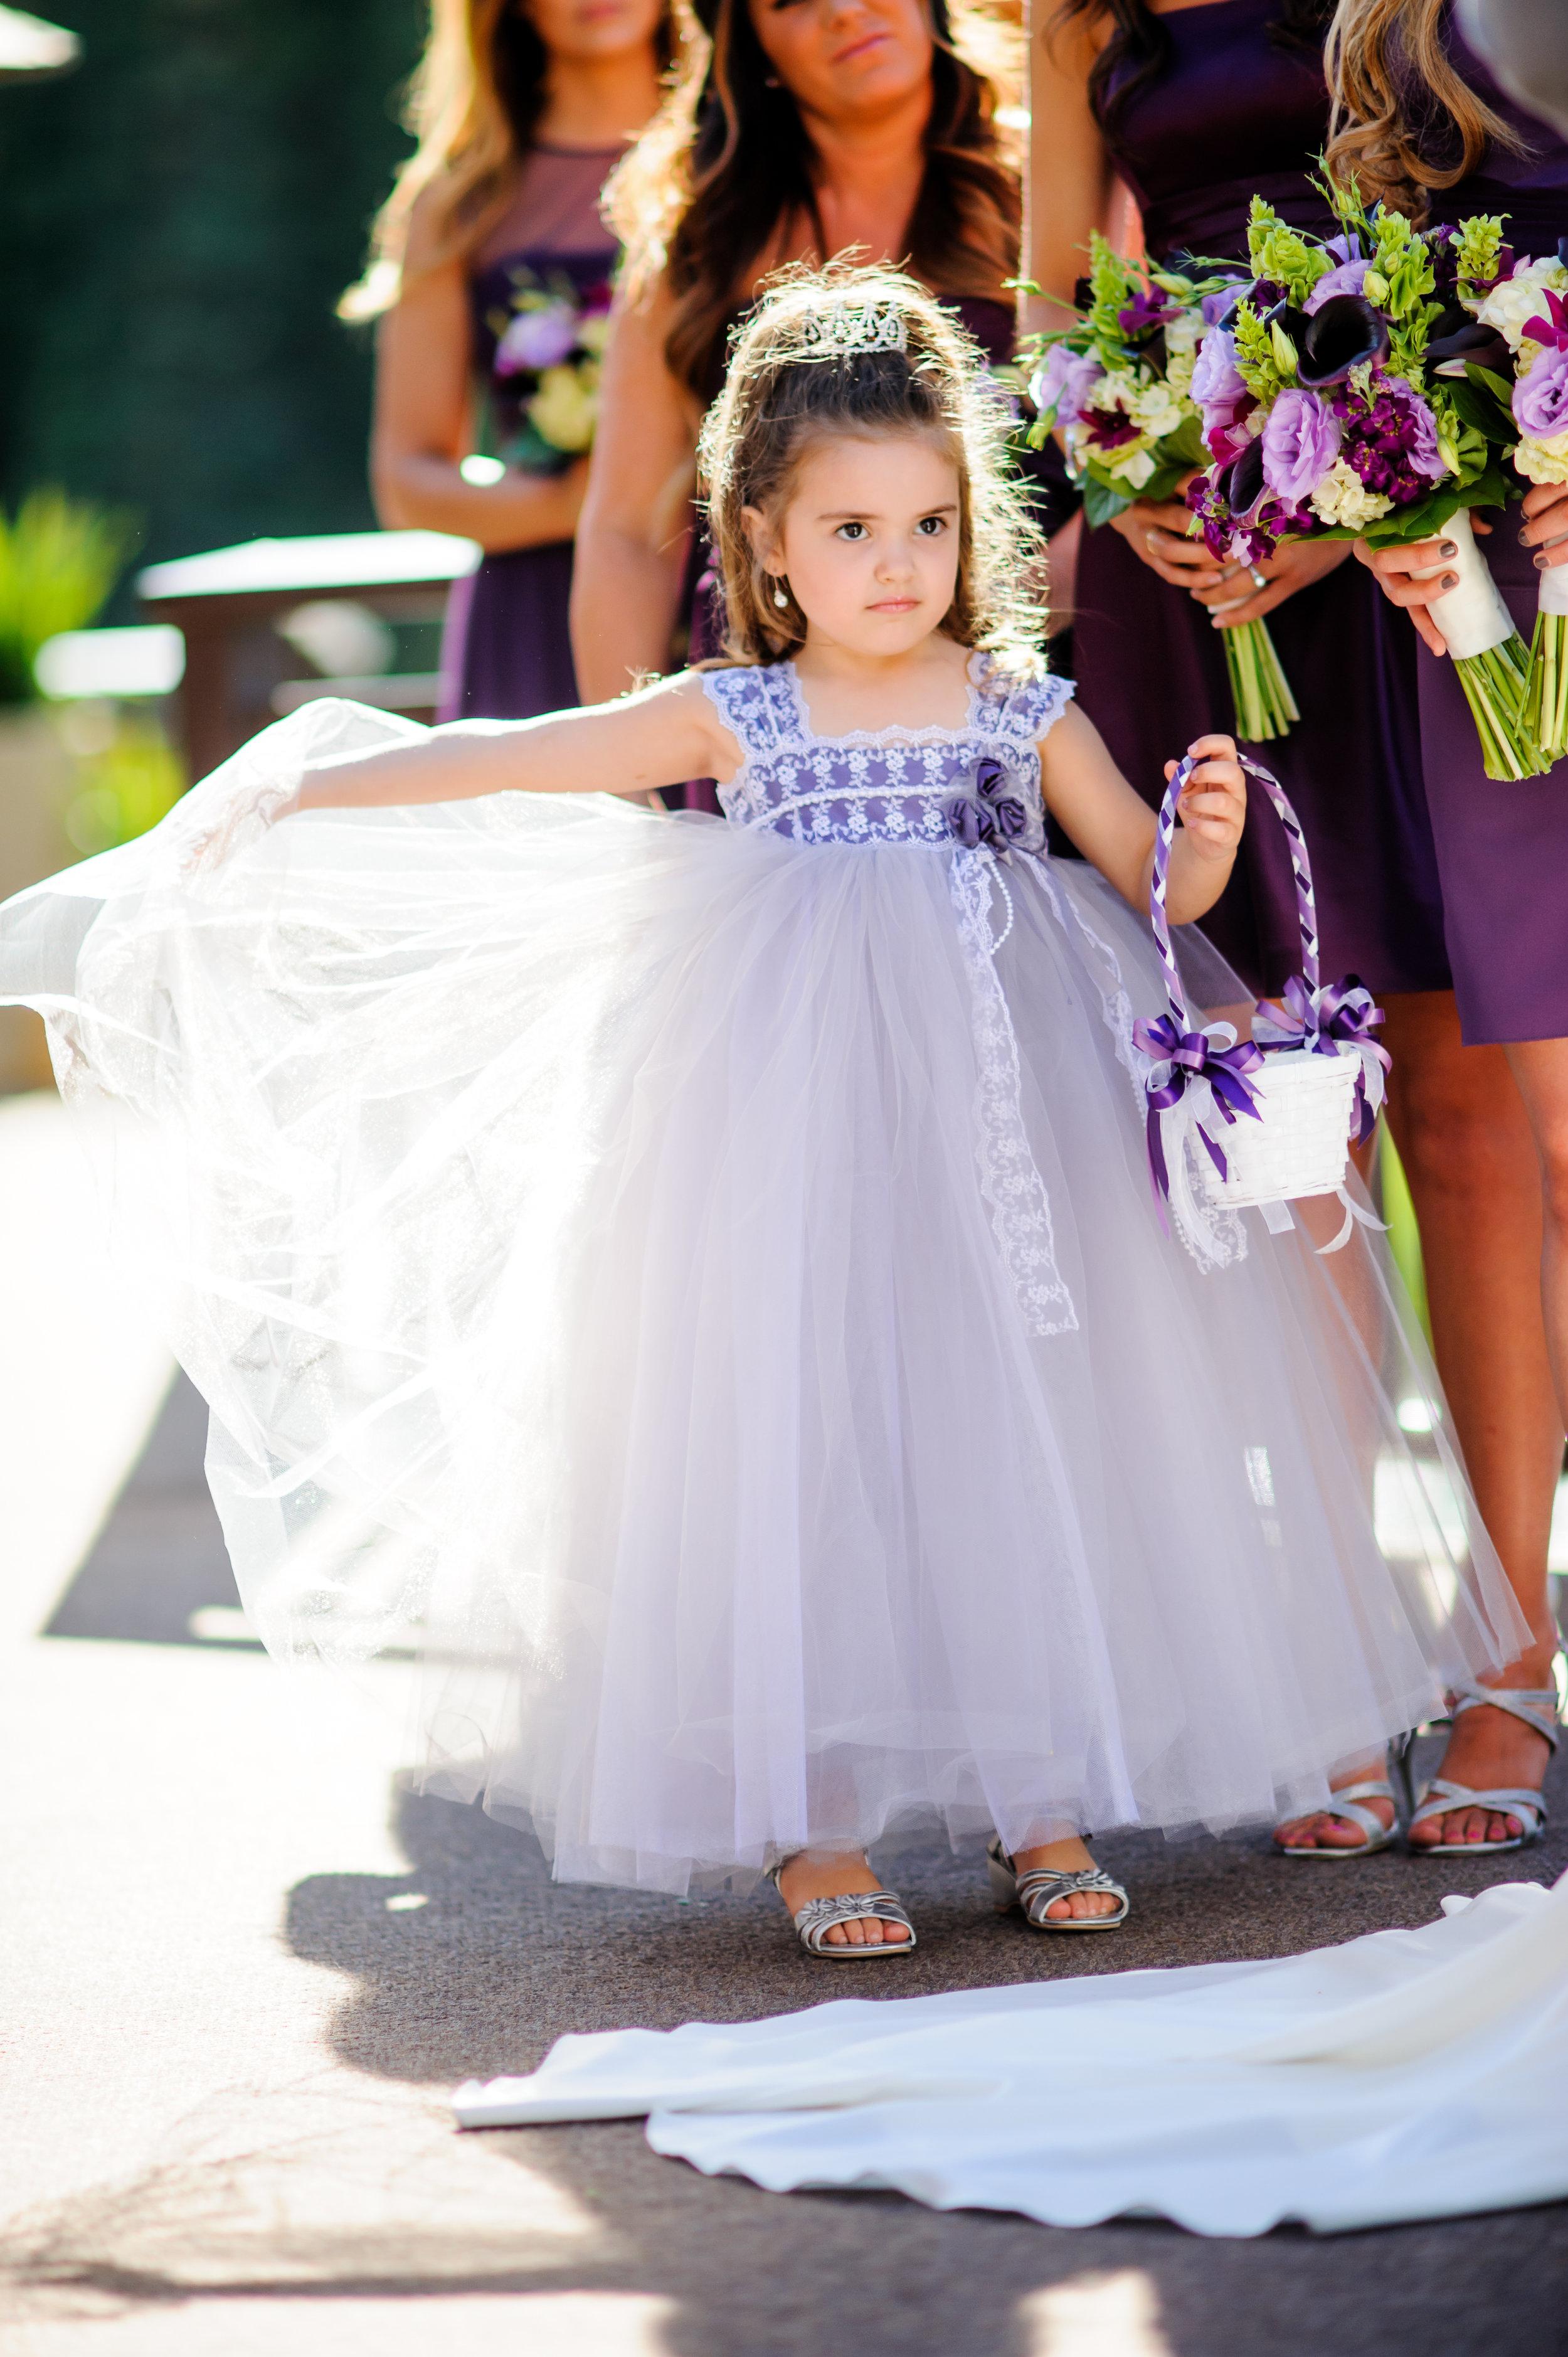 becca-jacob-016-tenaya-lodge-yosemite-wedding-photographer-katherine-nicole-photography.JPG